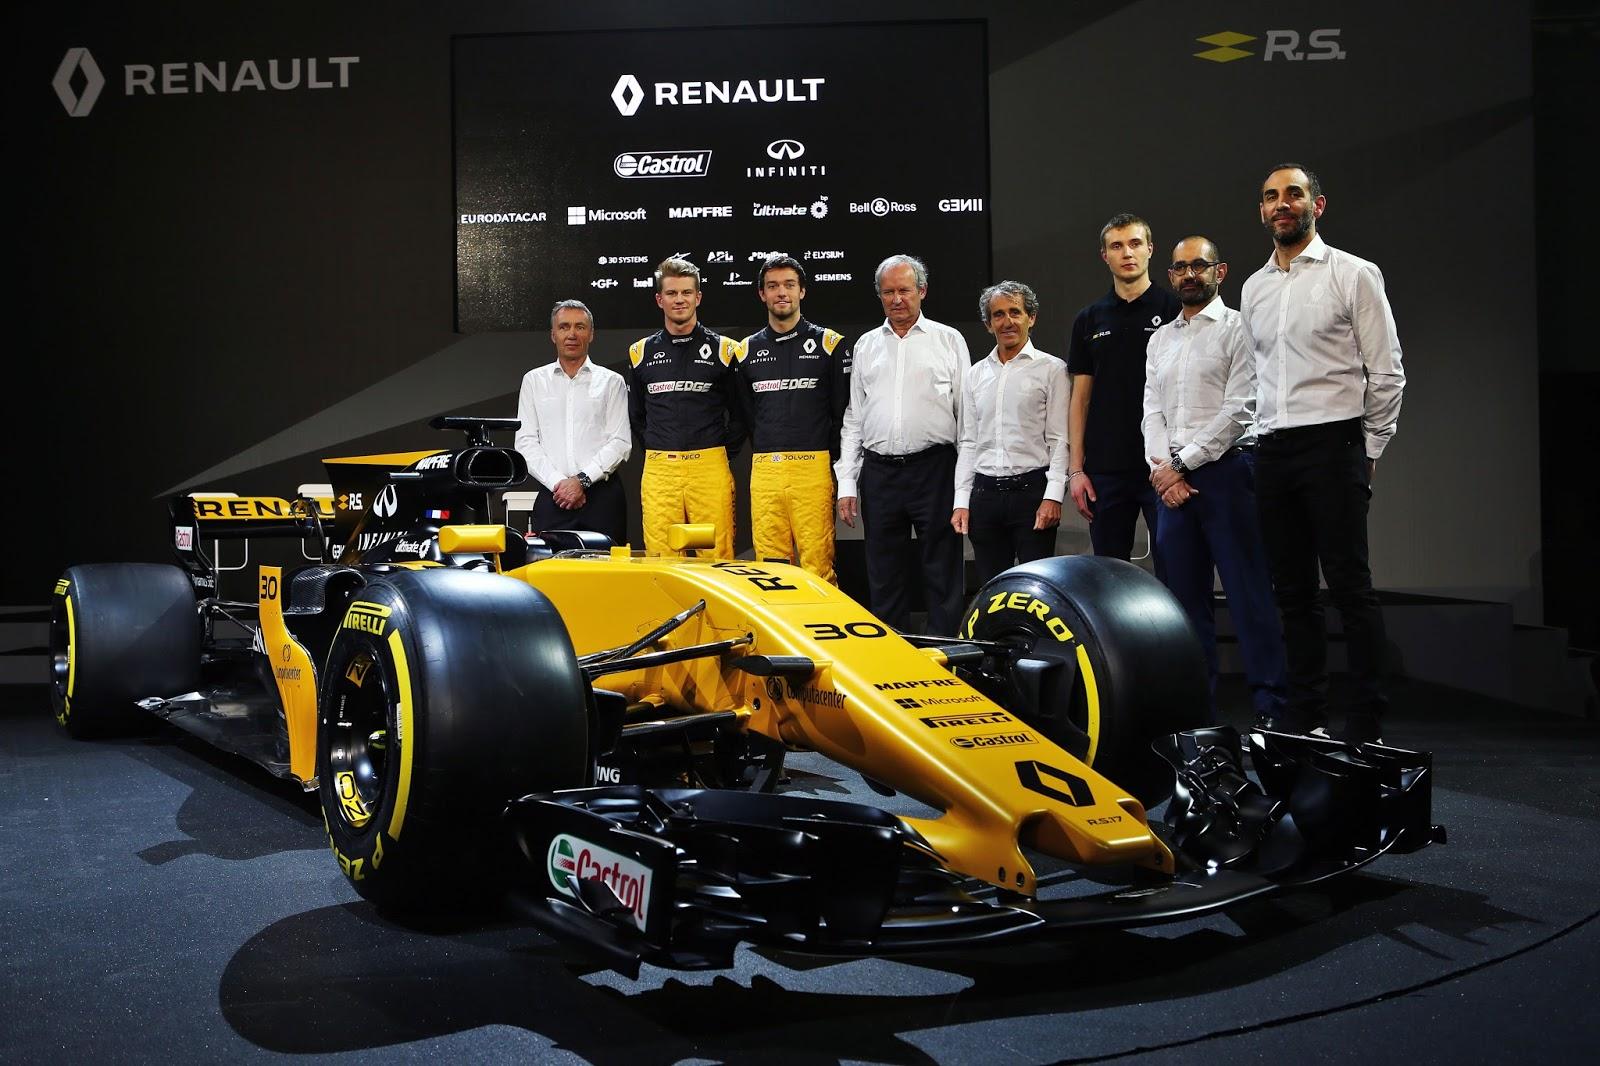 20170221161528 be813039 Η Renault Sport παρουσίασε το καινούργιο της μονοθέσιο, την R.S.17 F1, Formula 1, Renault, Renault Sport Formula 1 Team, videos